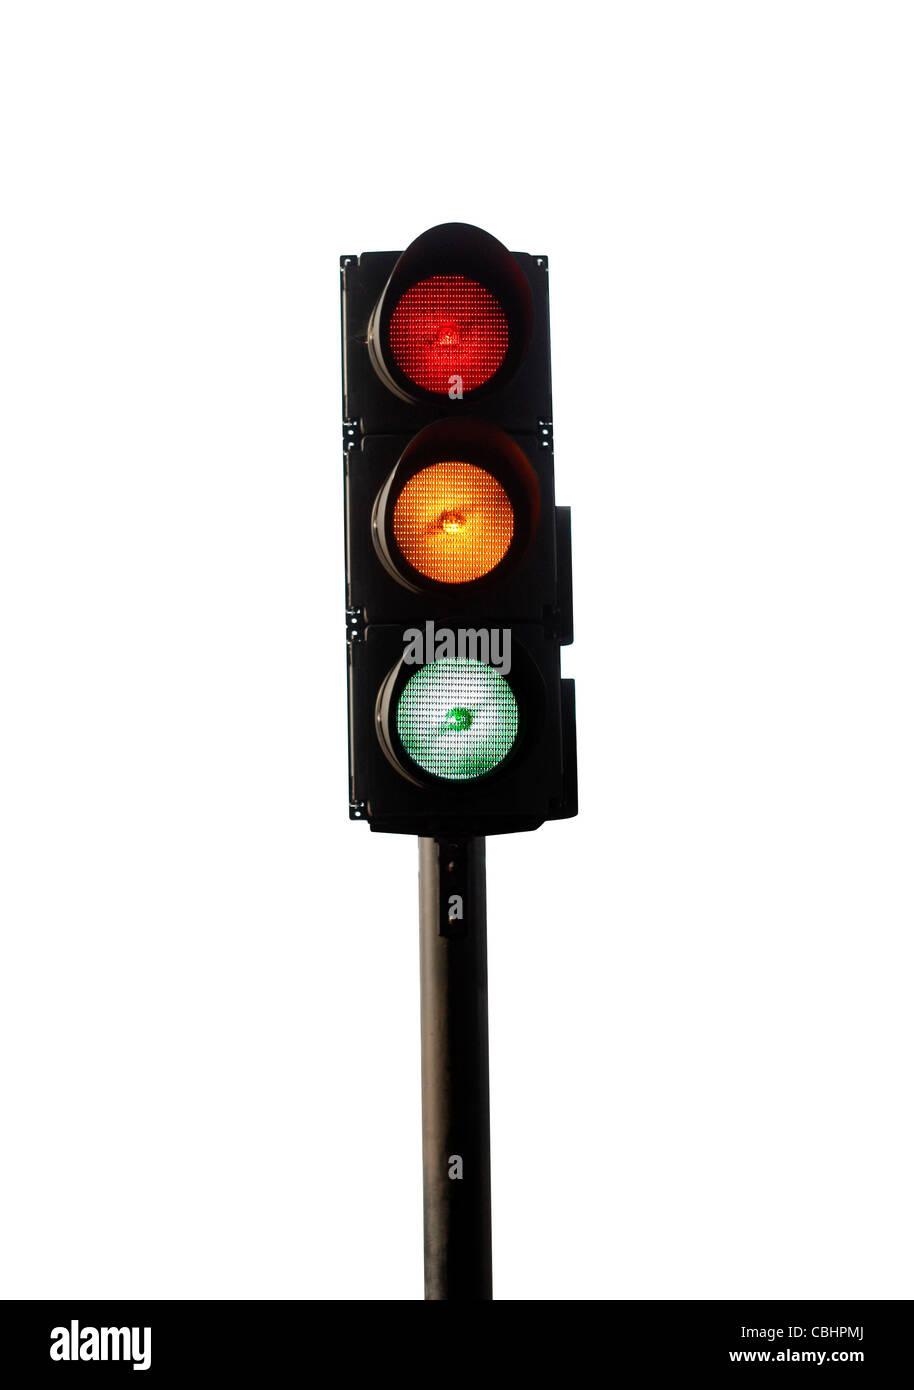 Traffic lights - Stock Image